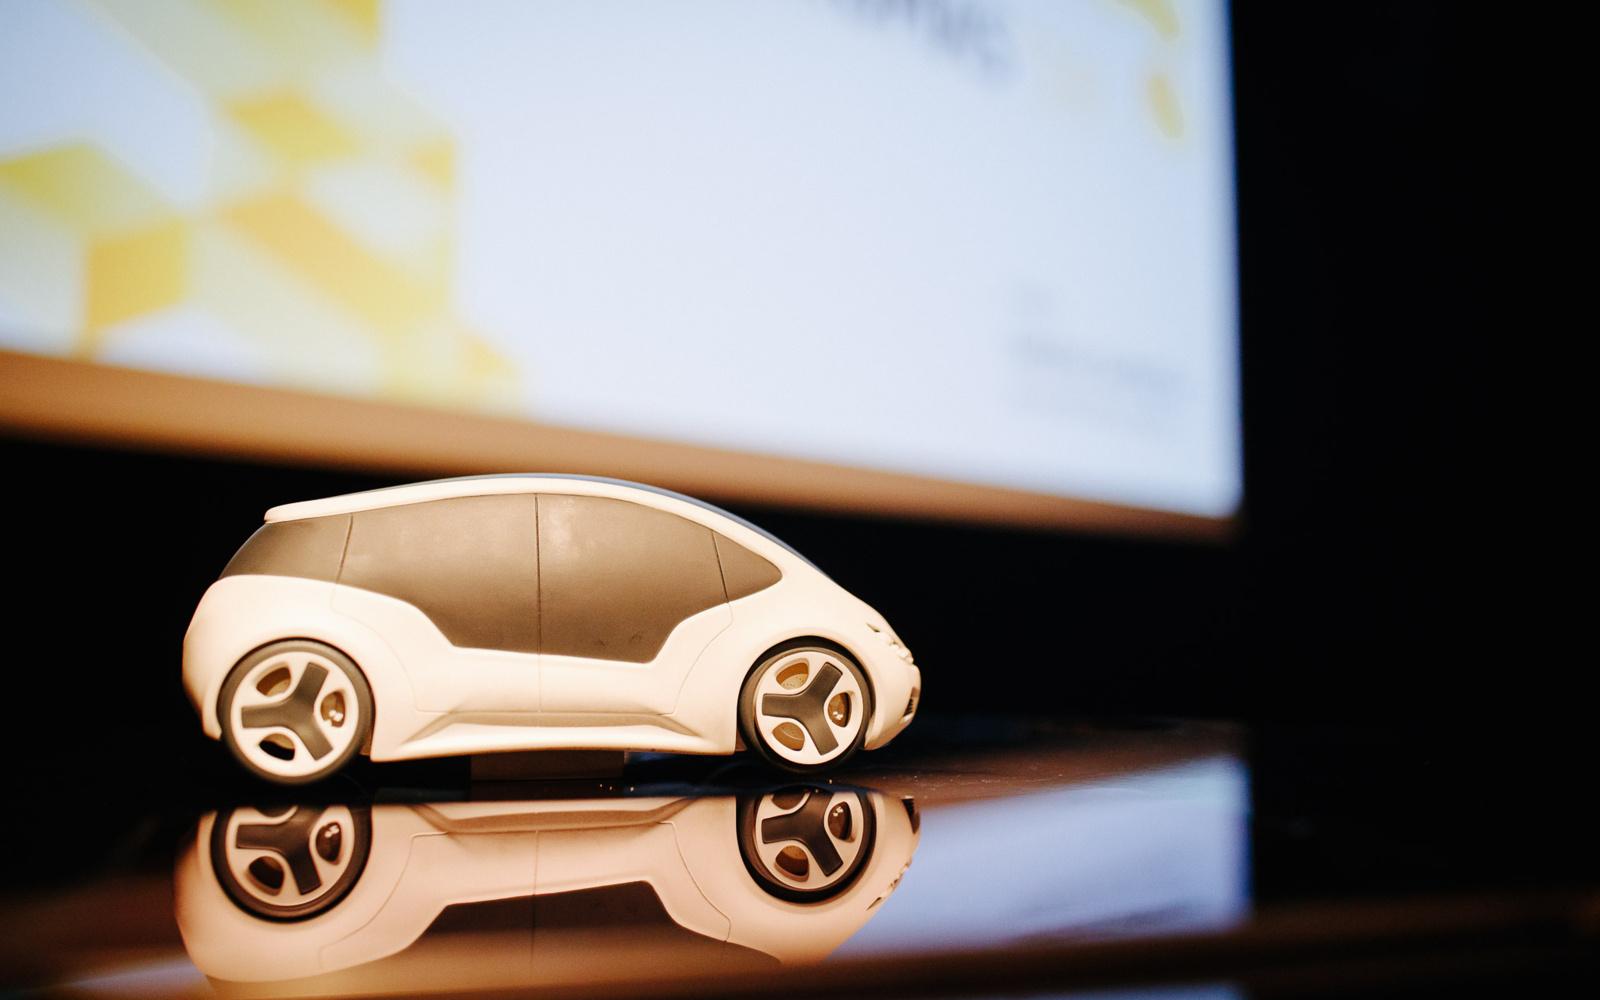 Automobilių remonto verslo skaidrumas – kodėl vis dar delsiama?